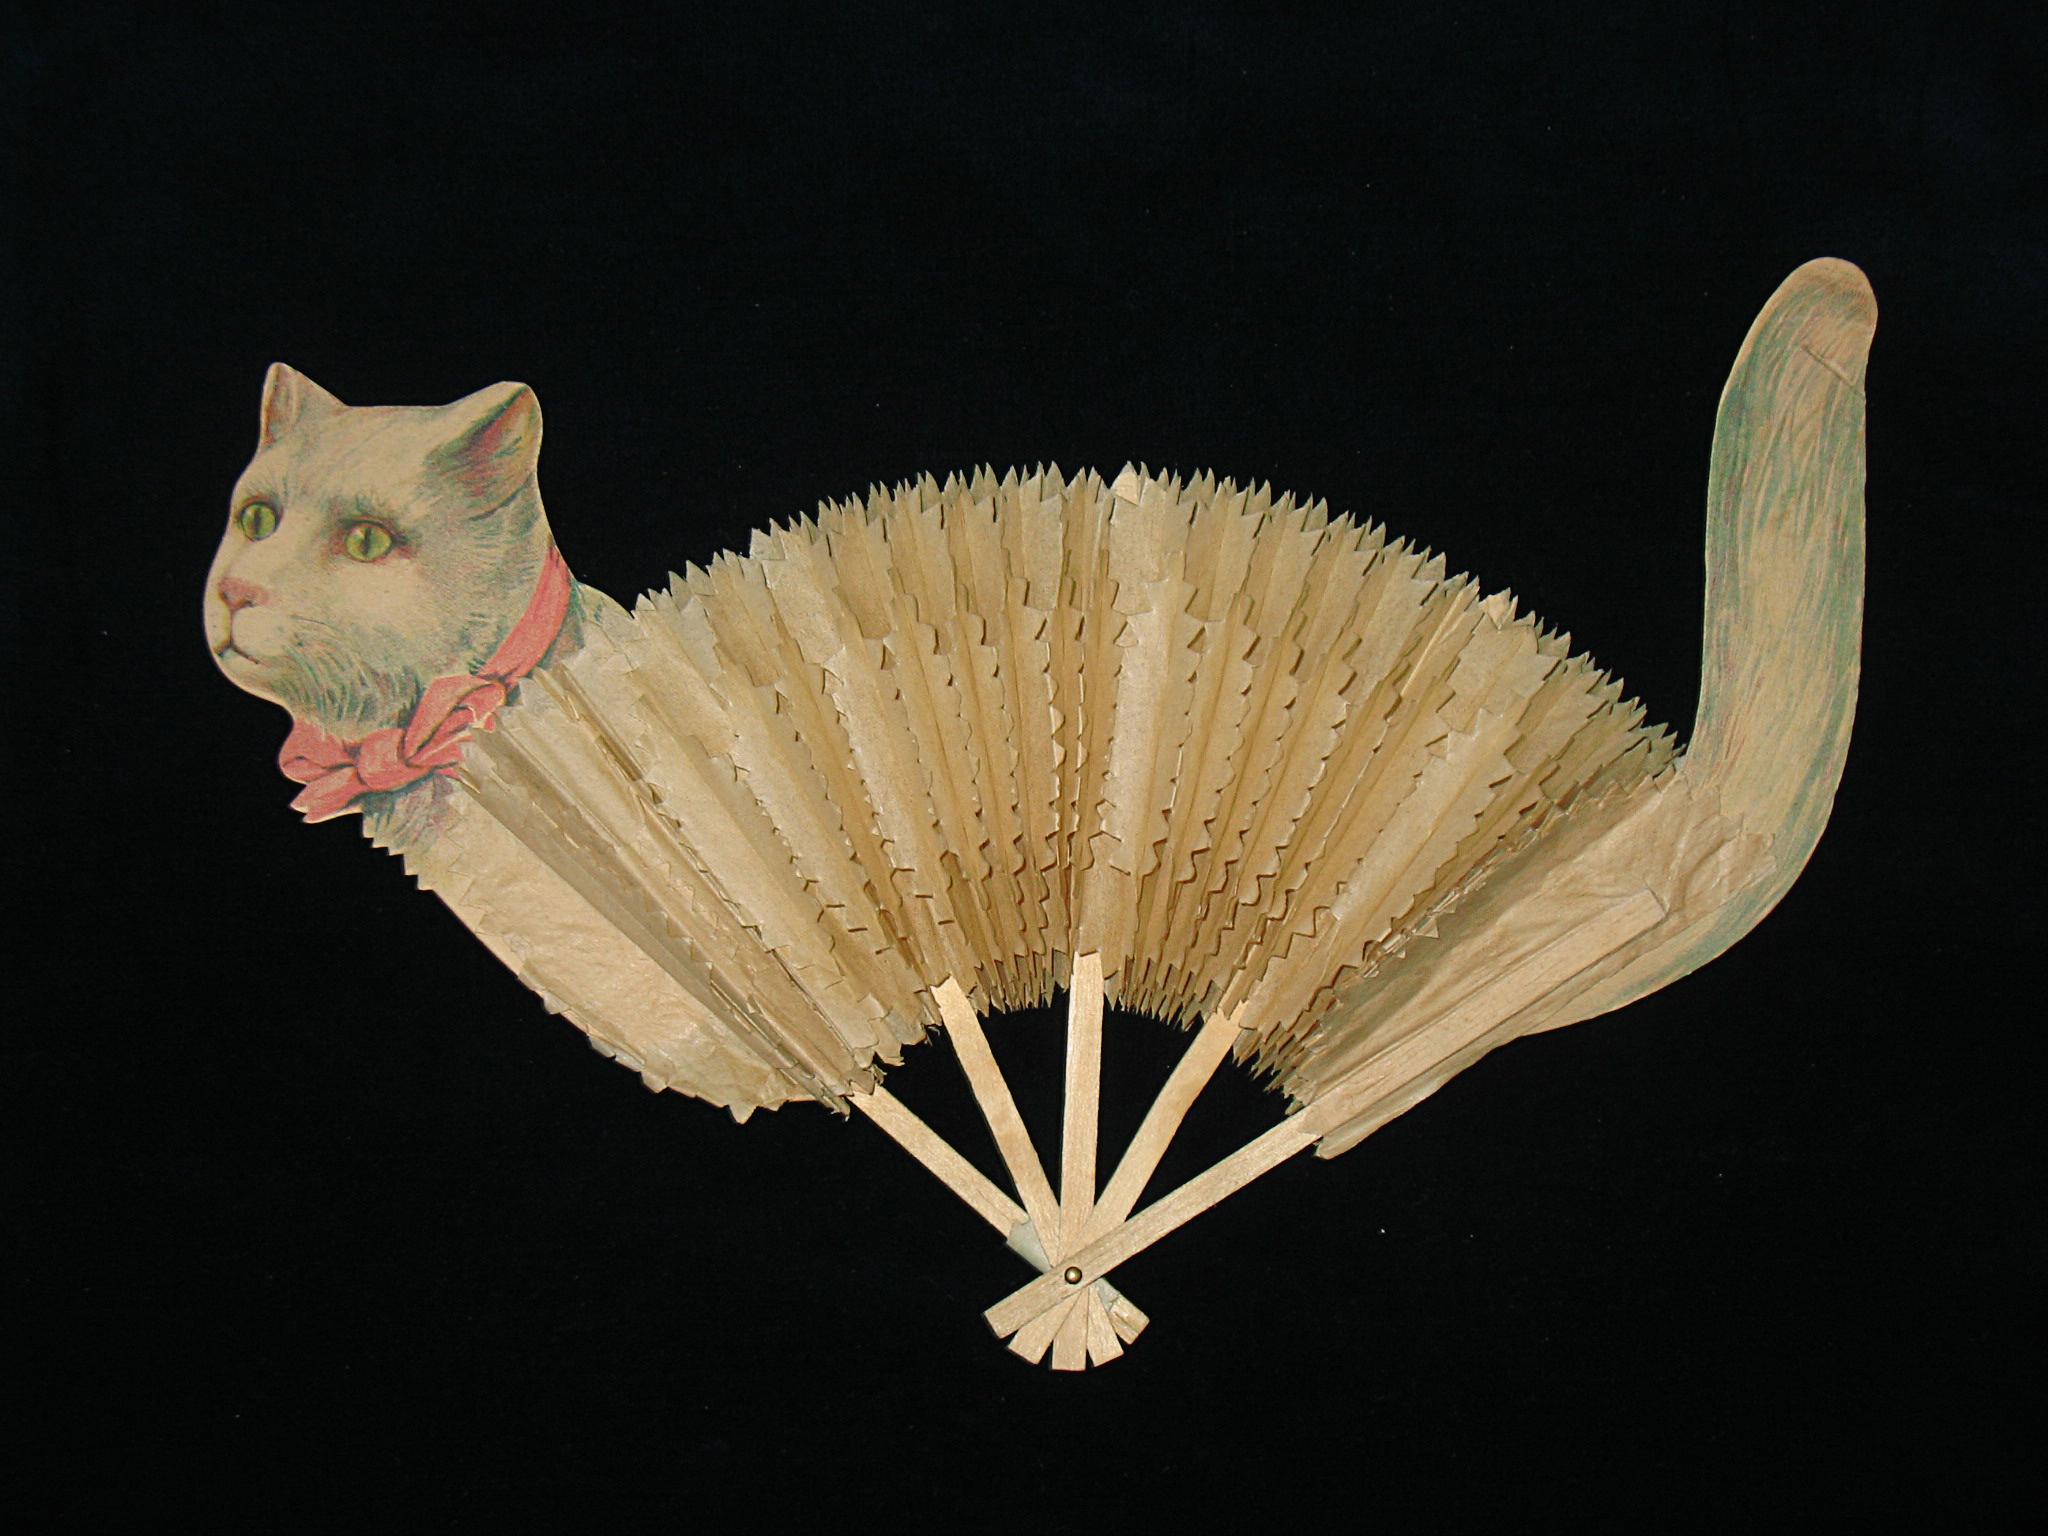 Animal_Cat1.jpg